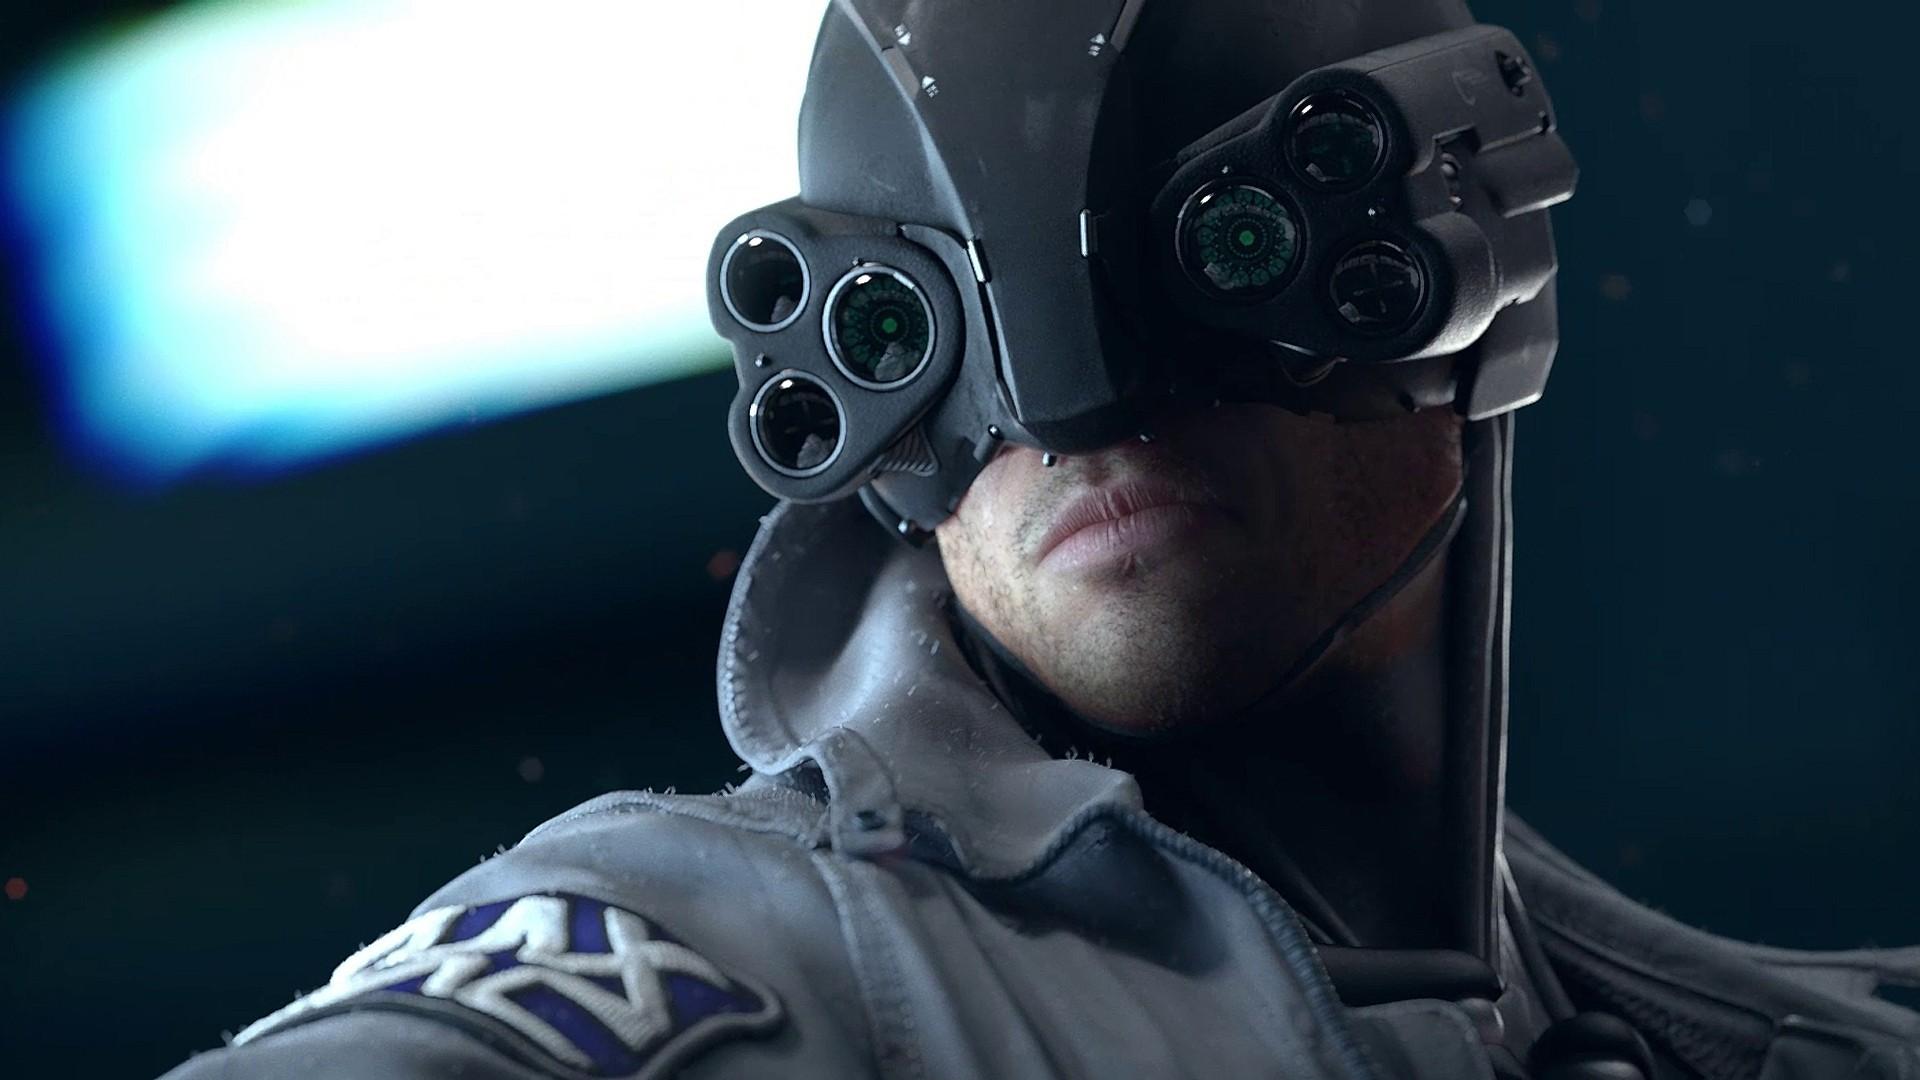 General 1920x1080 Cyberpunk 2077 cyberpunk video games science fiction